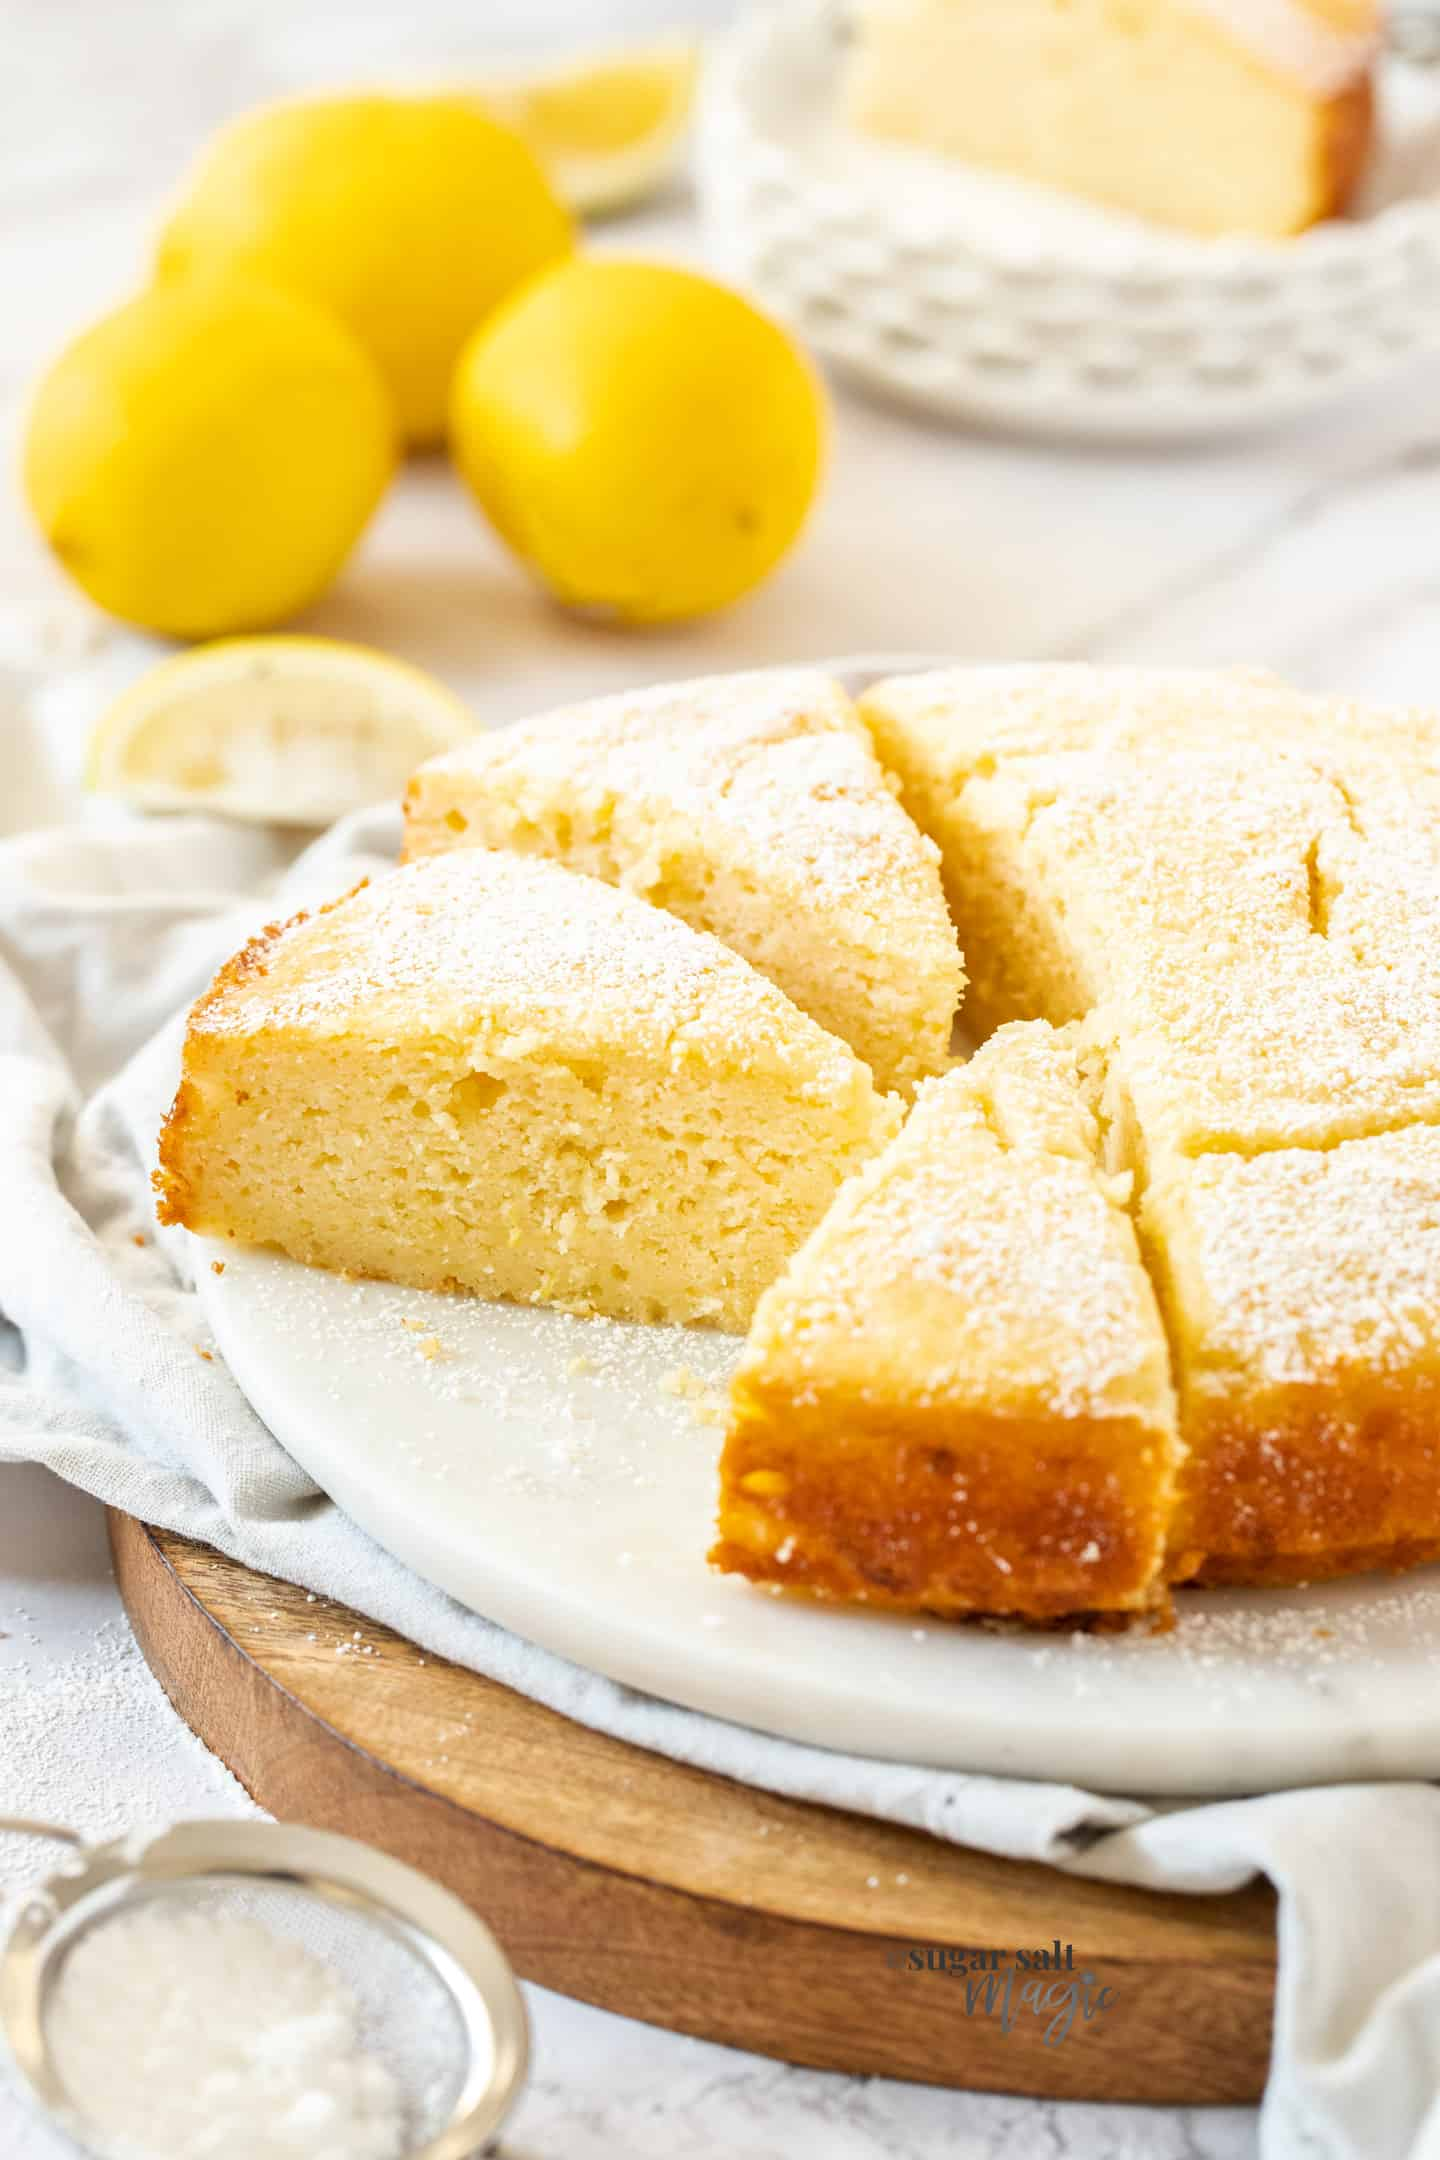 A lemon ricotta cake cut into slices on a white platter. Lemons in the background.